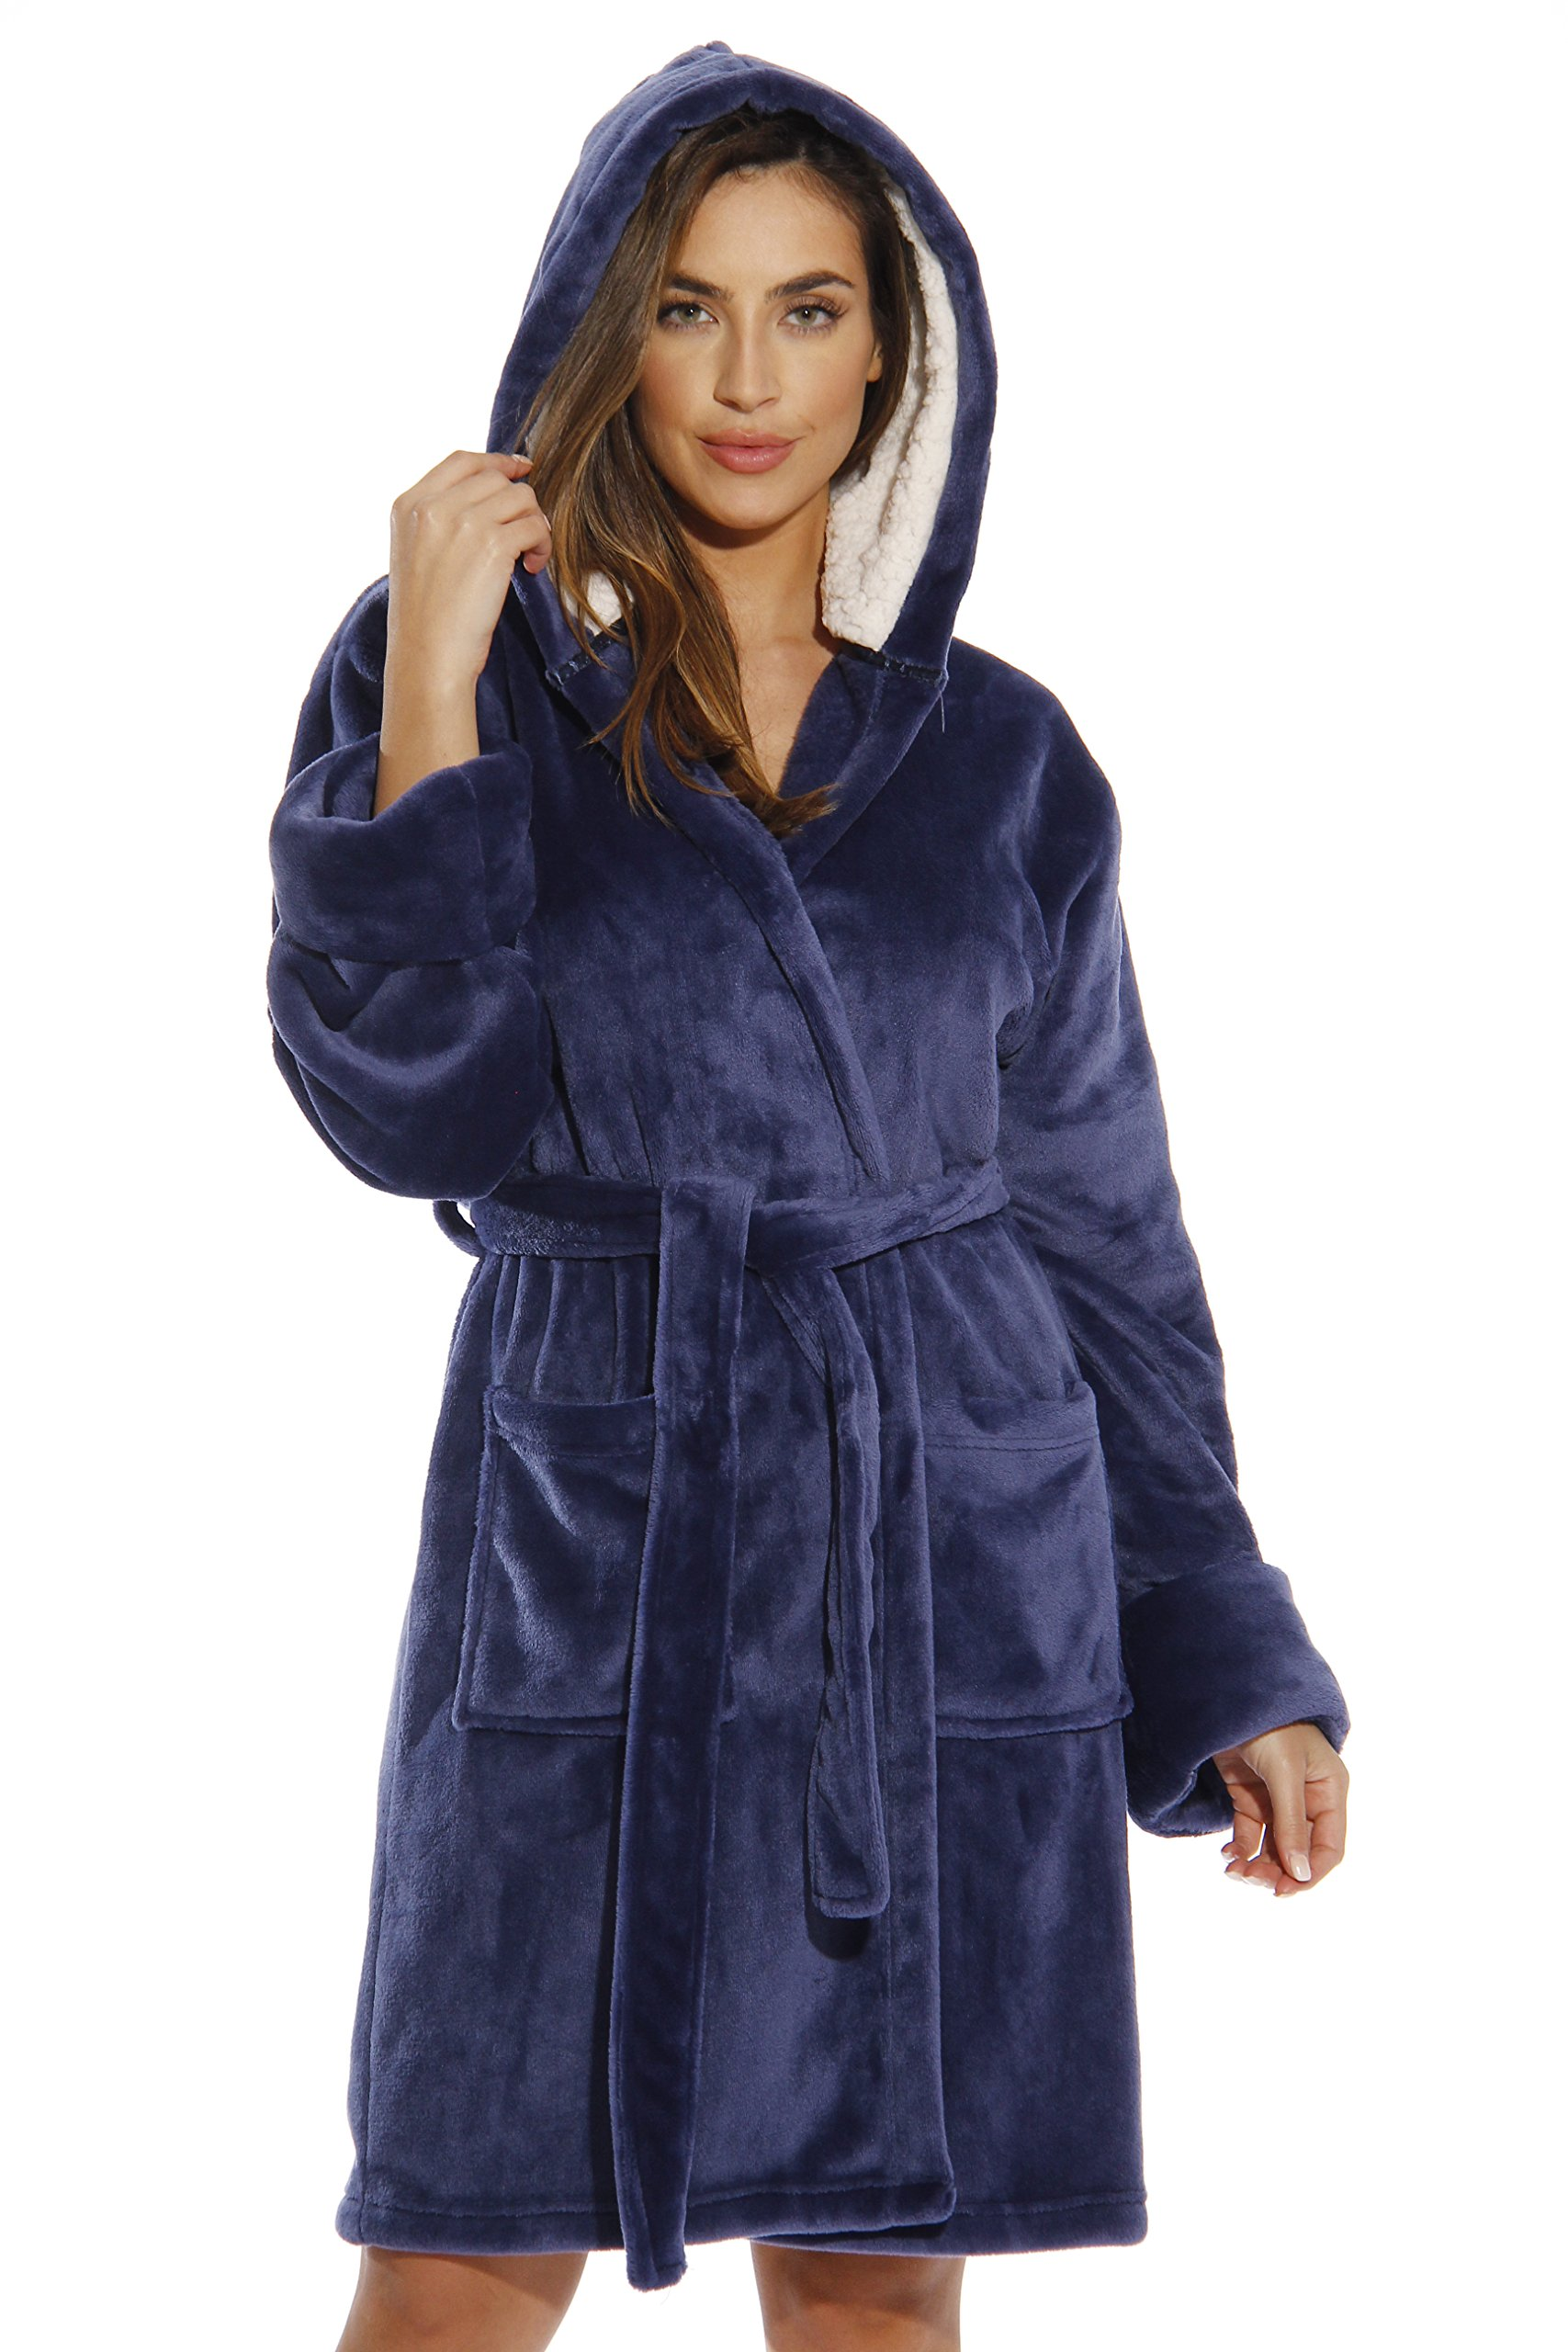 6364-NVY-M Just Love Kimono Robe / Bath Robes for Women